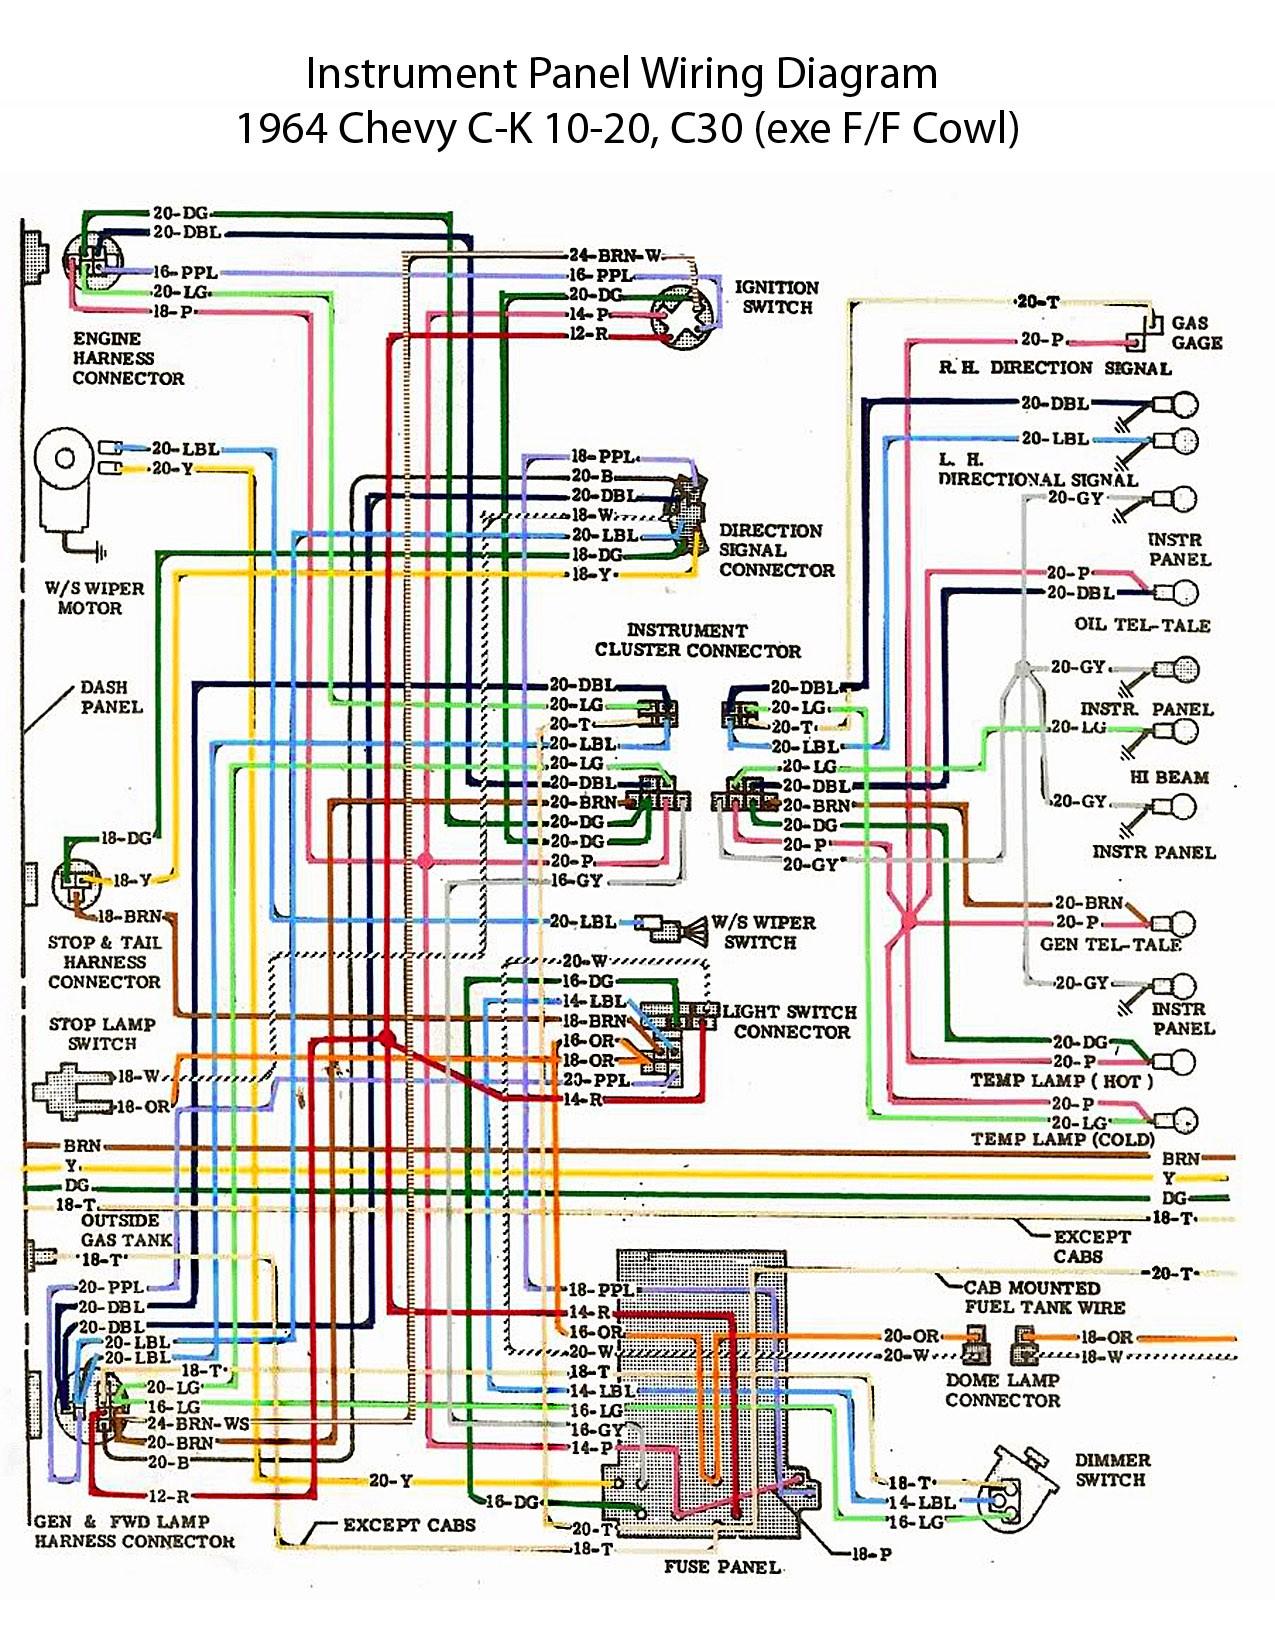 Bike Wiring Diagram 2008 Bmw Headlight Electric Instrument Panel Of